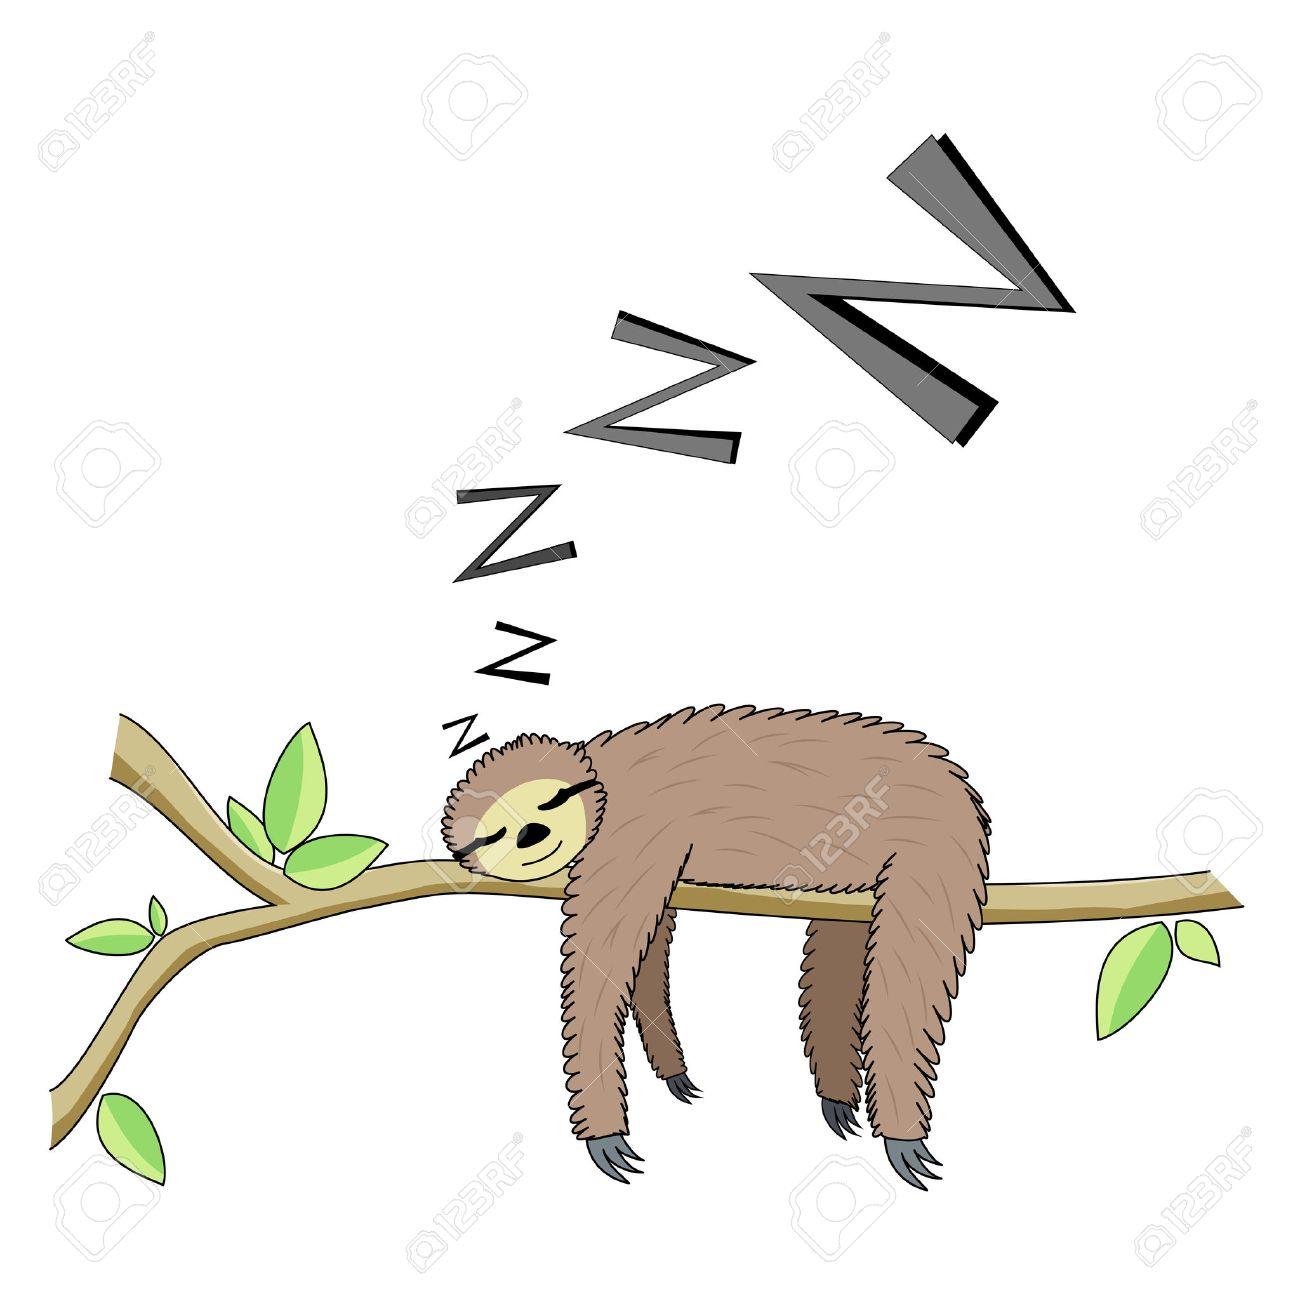 2 173 sloth cliparts stock vector and royalty free sloth illustrations rh 123rf com sloth clip art st patrick's day sloth clip art sitting